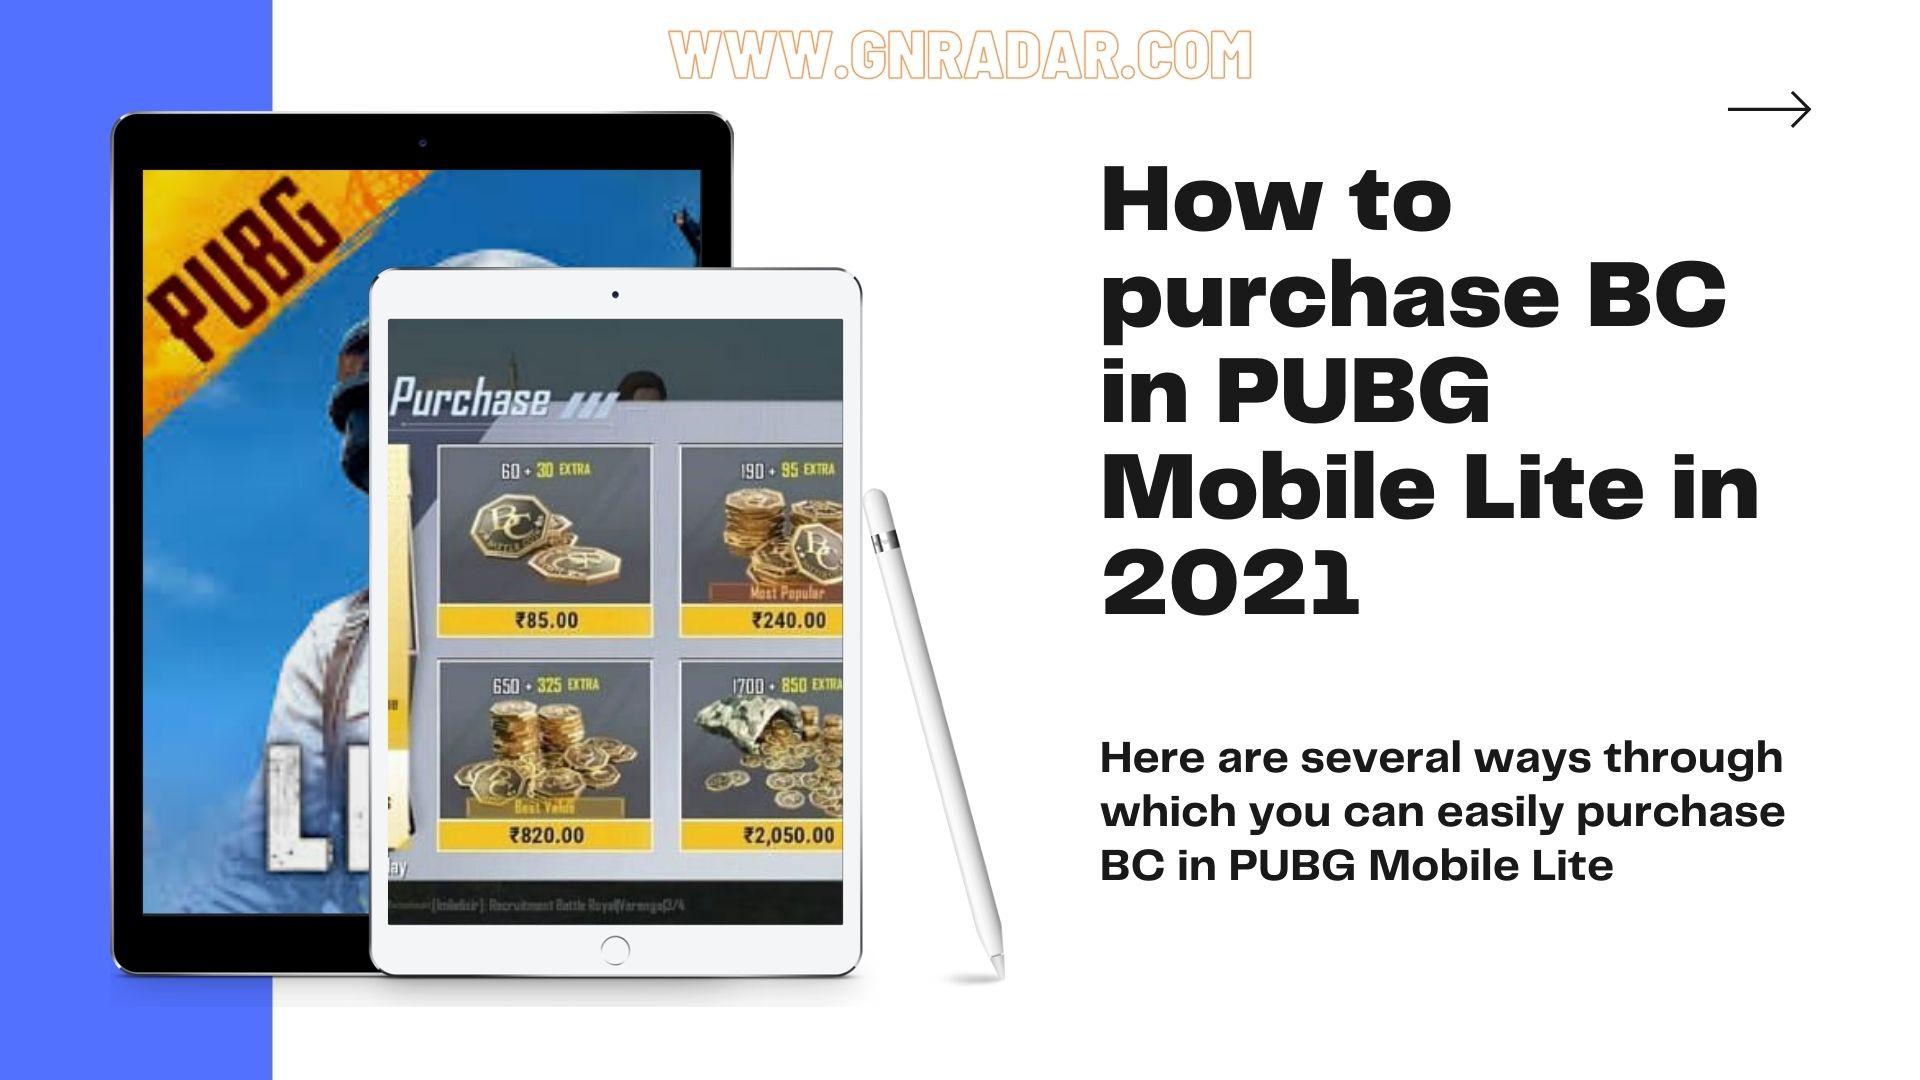 purchase BC in PUBG Mobile Lite in 2021 ...